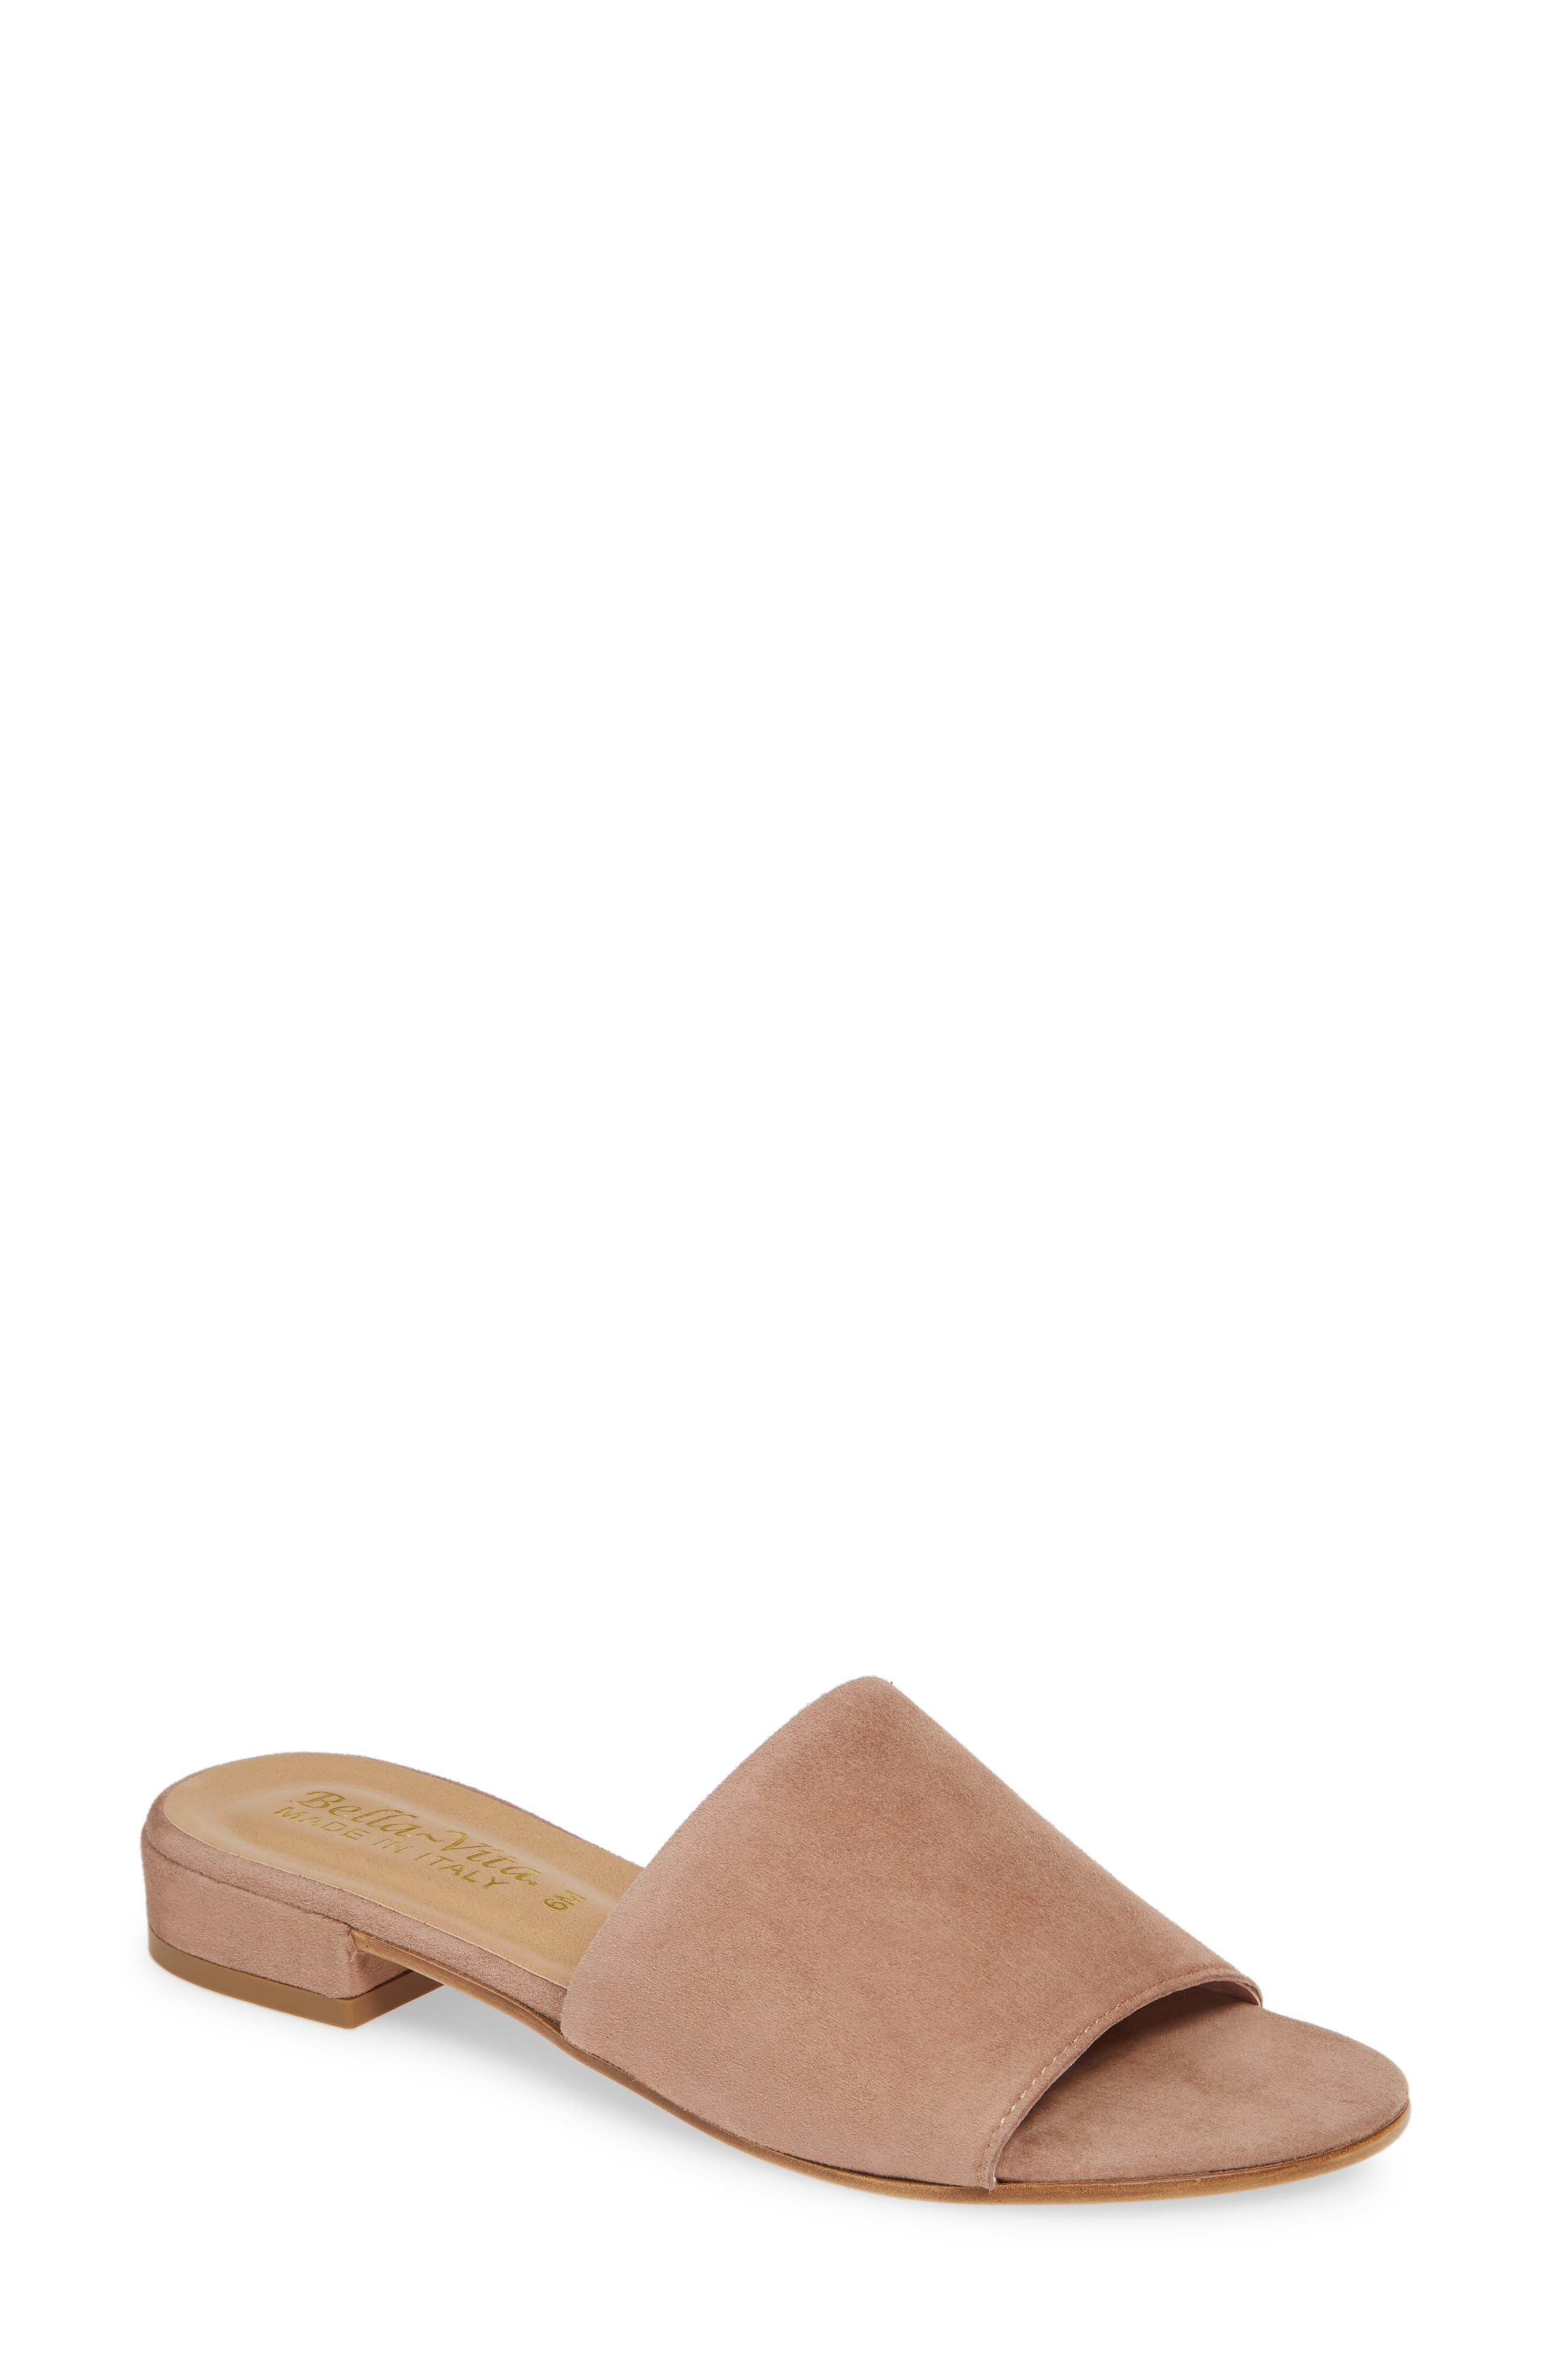 Bella Vita Slide Sandal, Pink